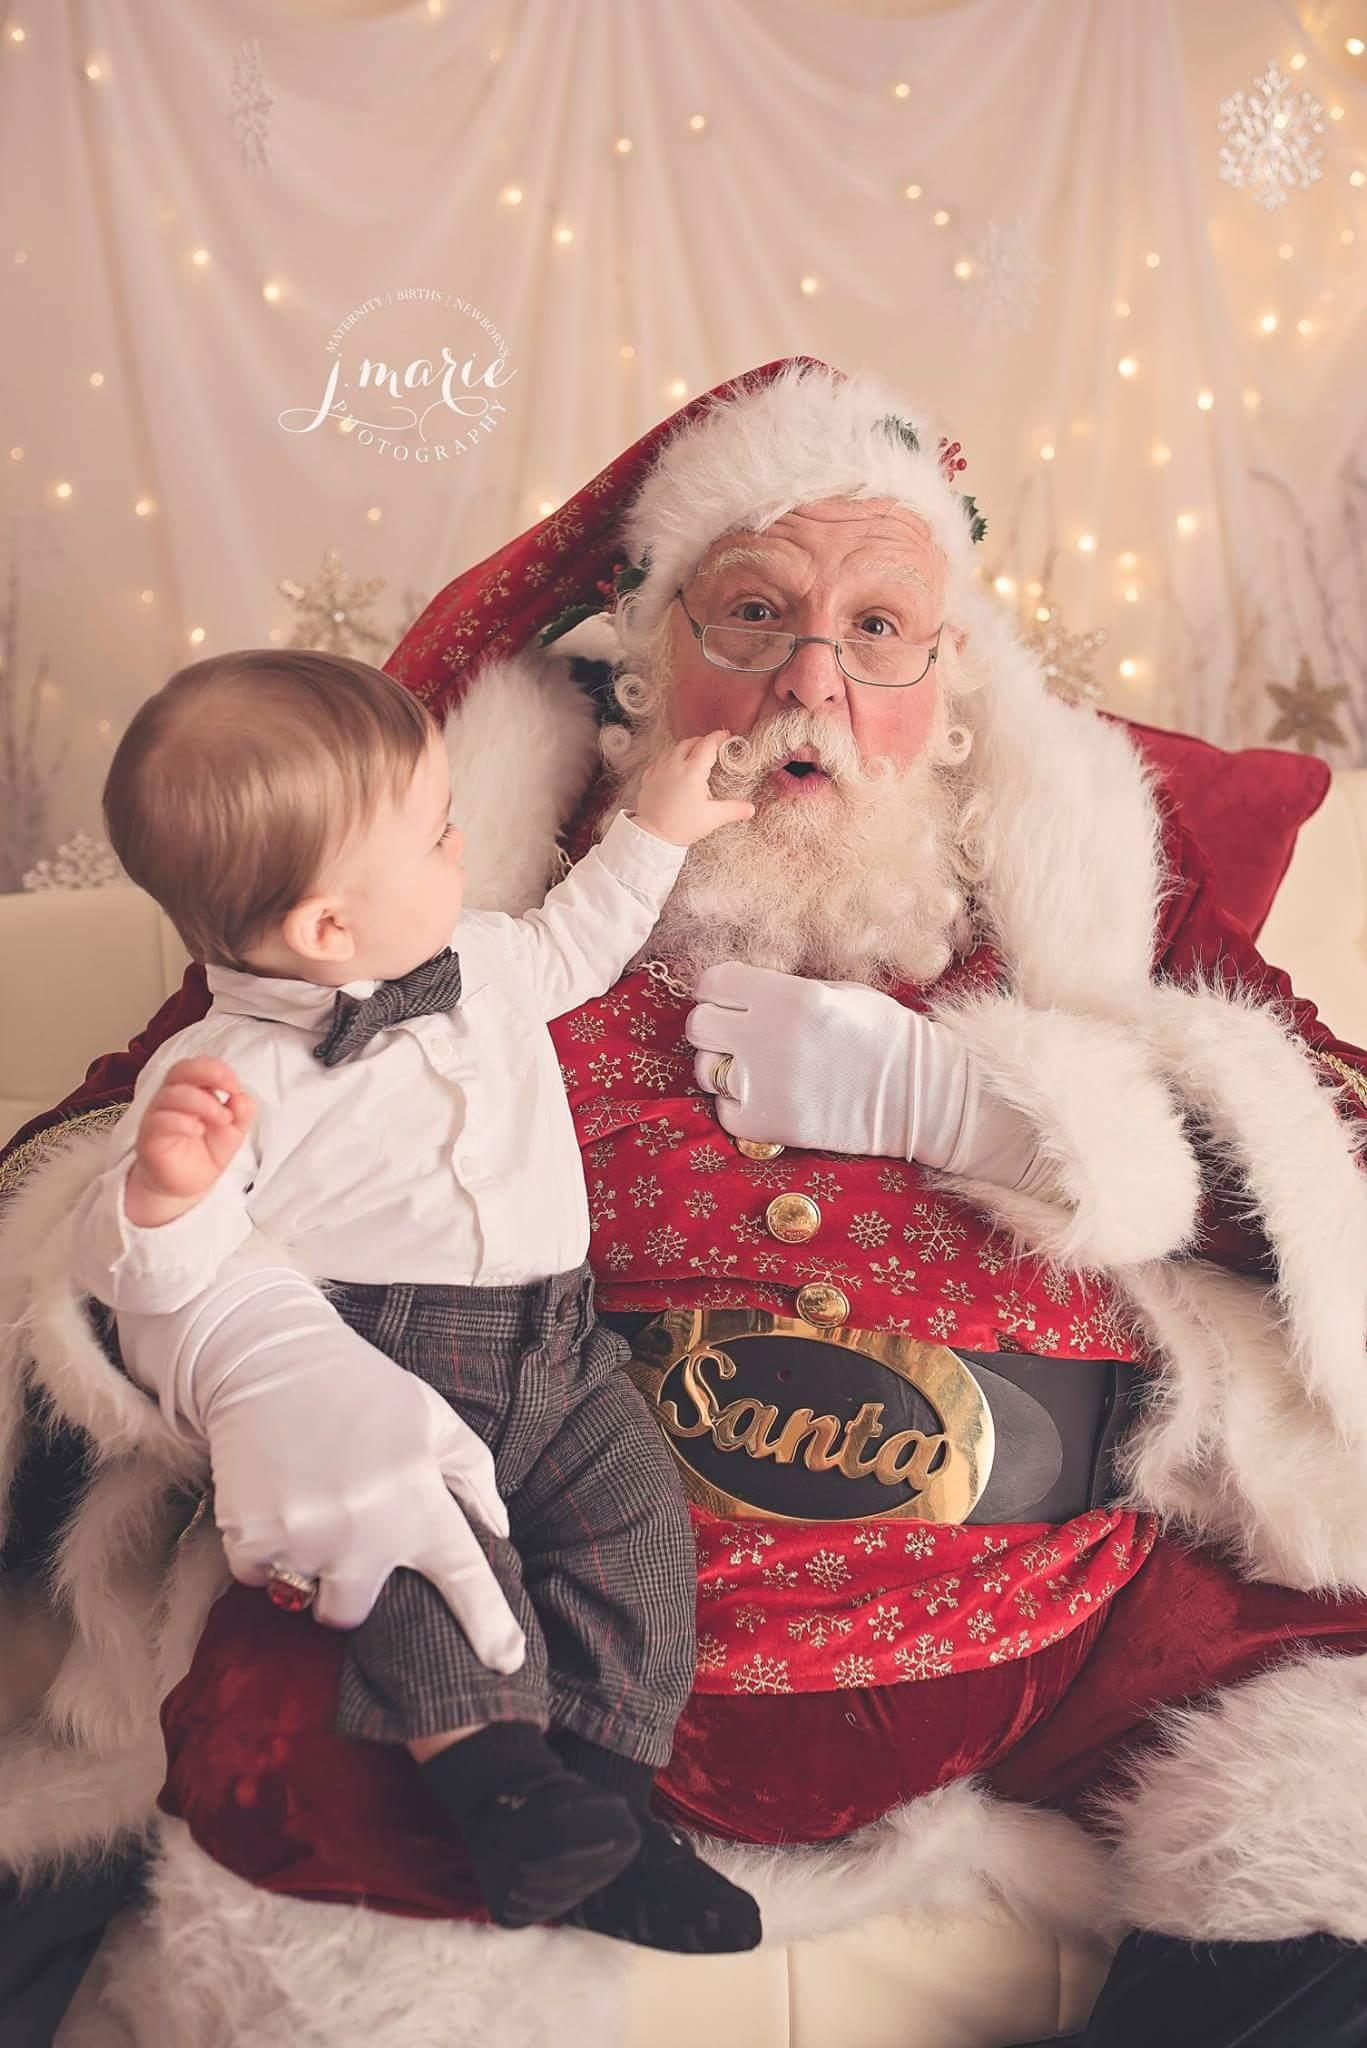 Tugging Santa's Beard